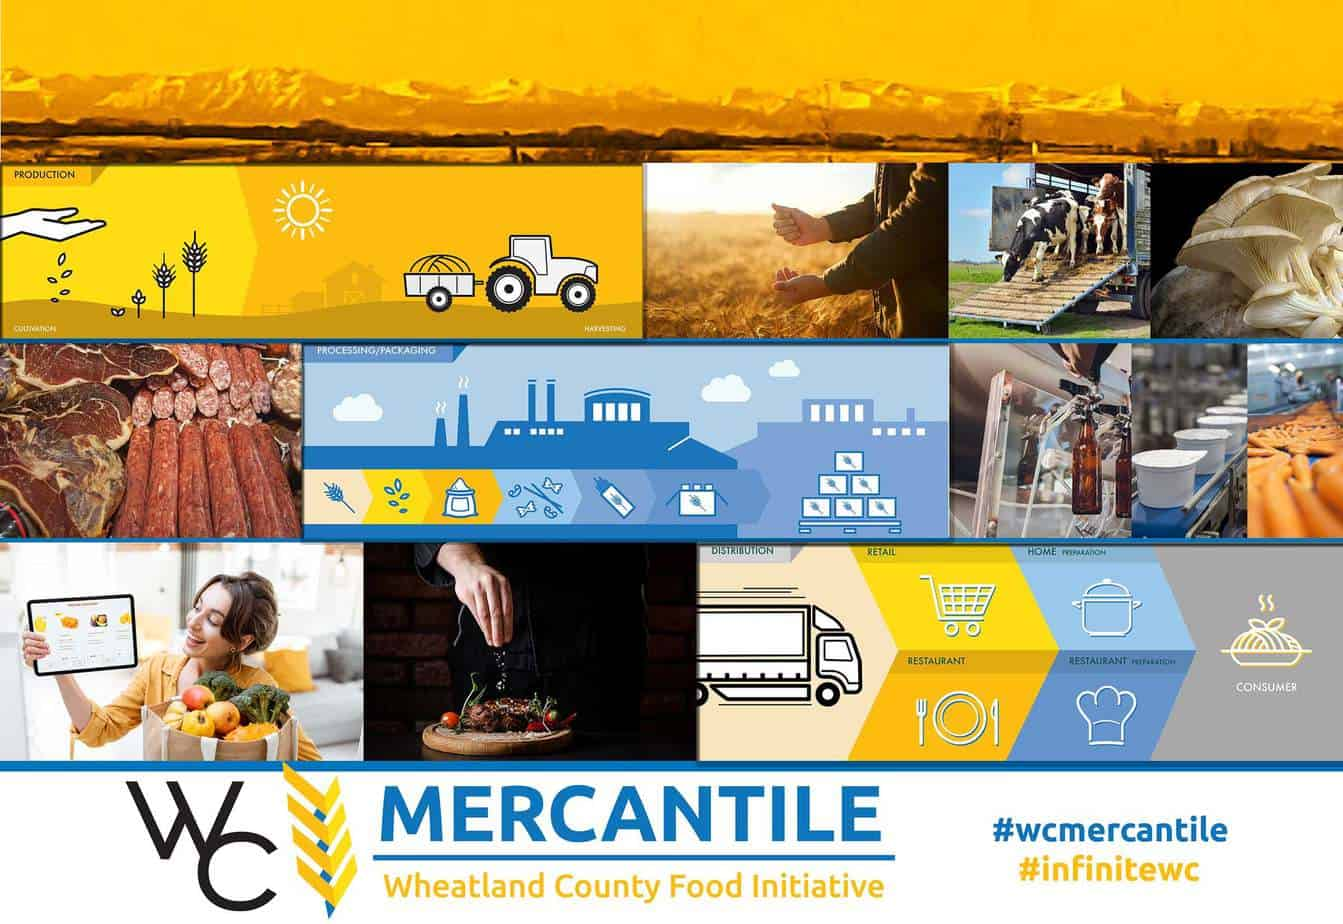 Wheatland County launches mercantile